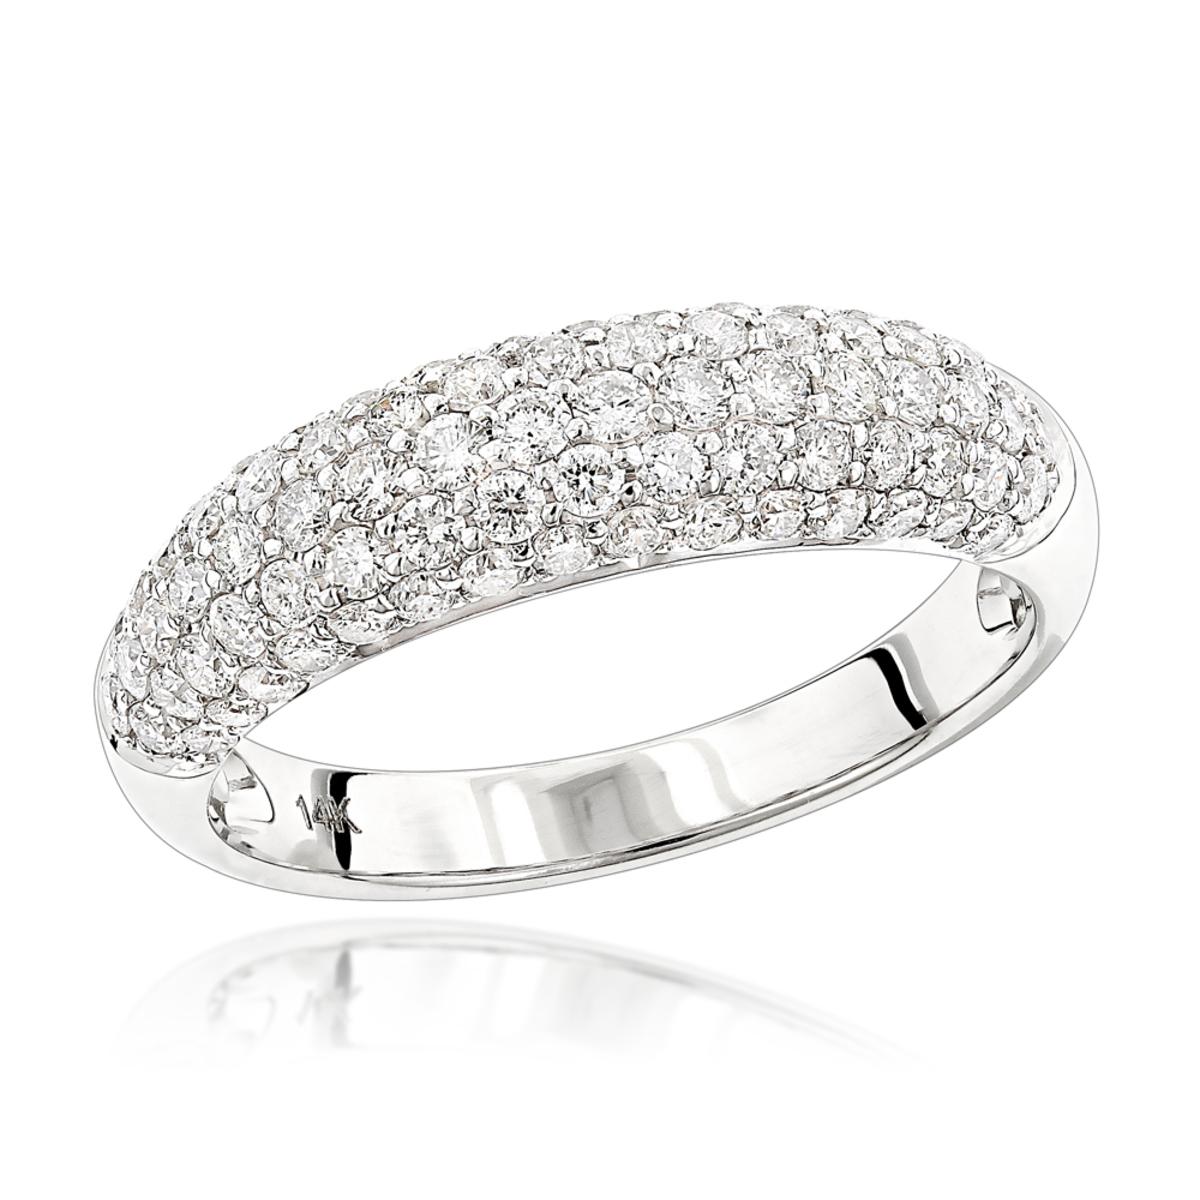 Unique Diamond Wedding Band for Women 14K Gold Pave Diamond Ring 1.3ct